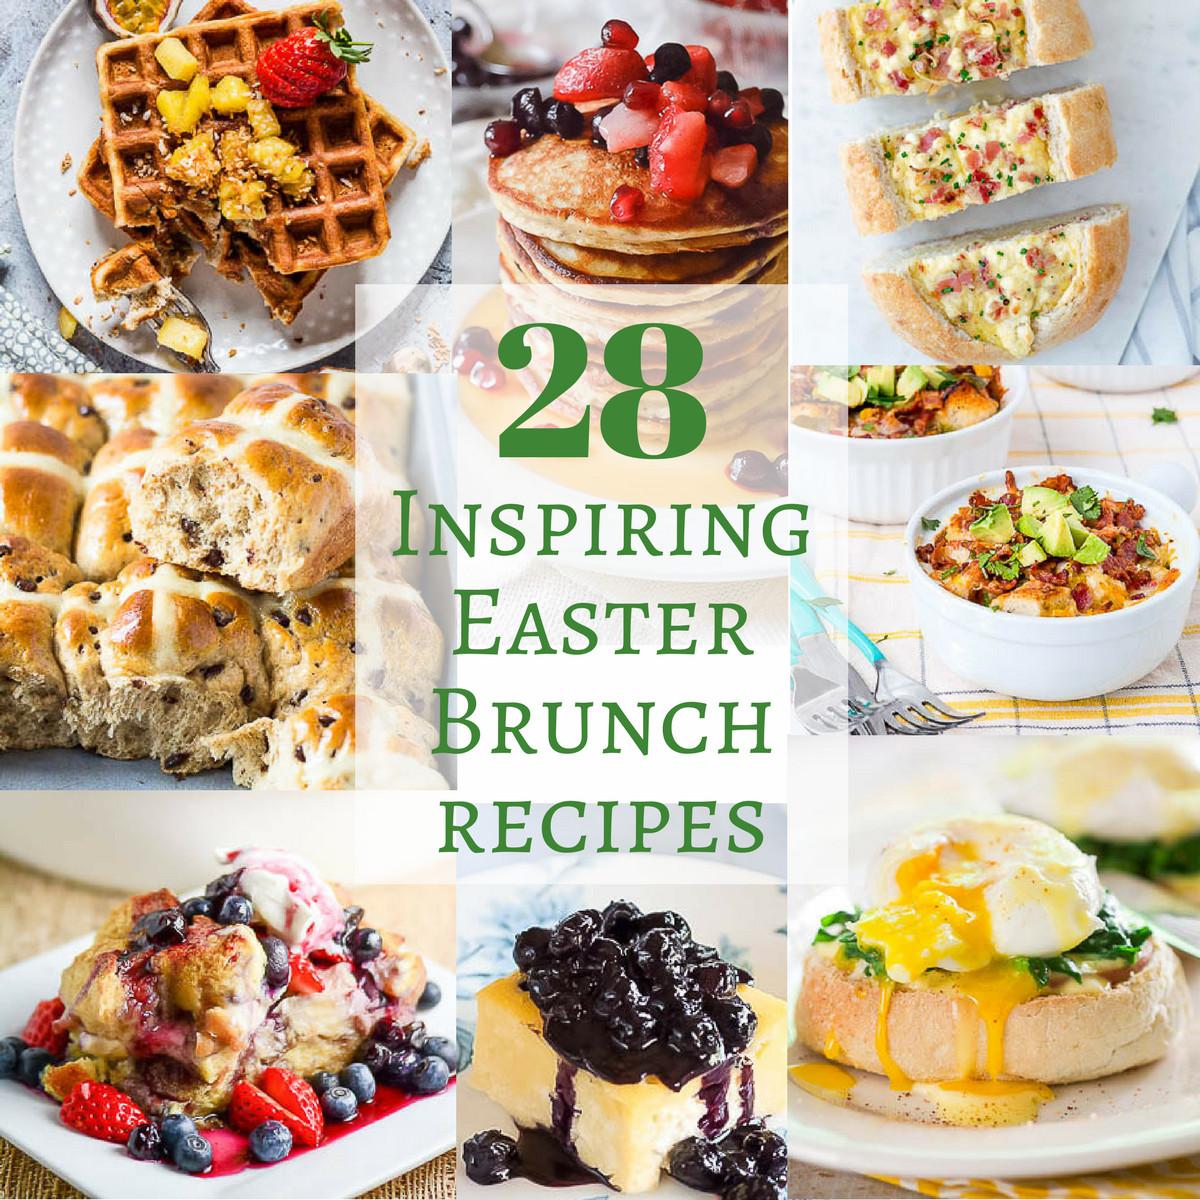 Easter Breakfast Recipes  28 Inspiring Easter Brunch Recipes